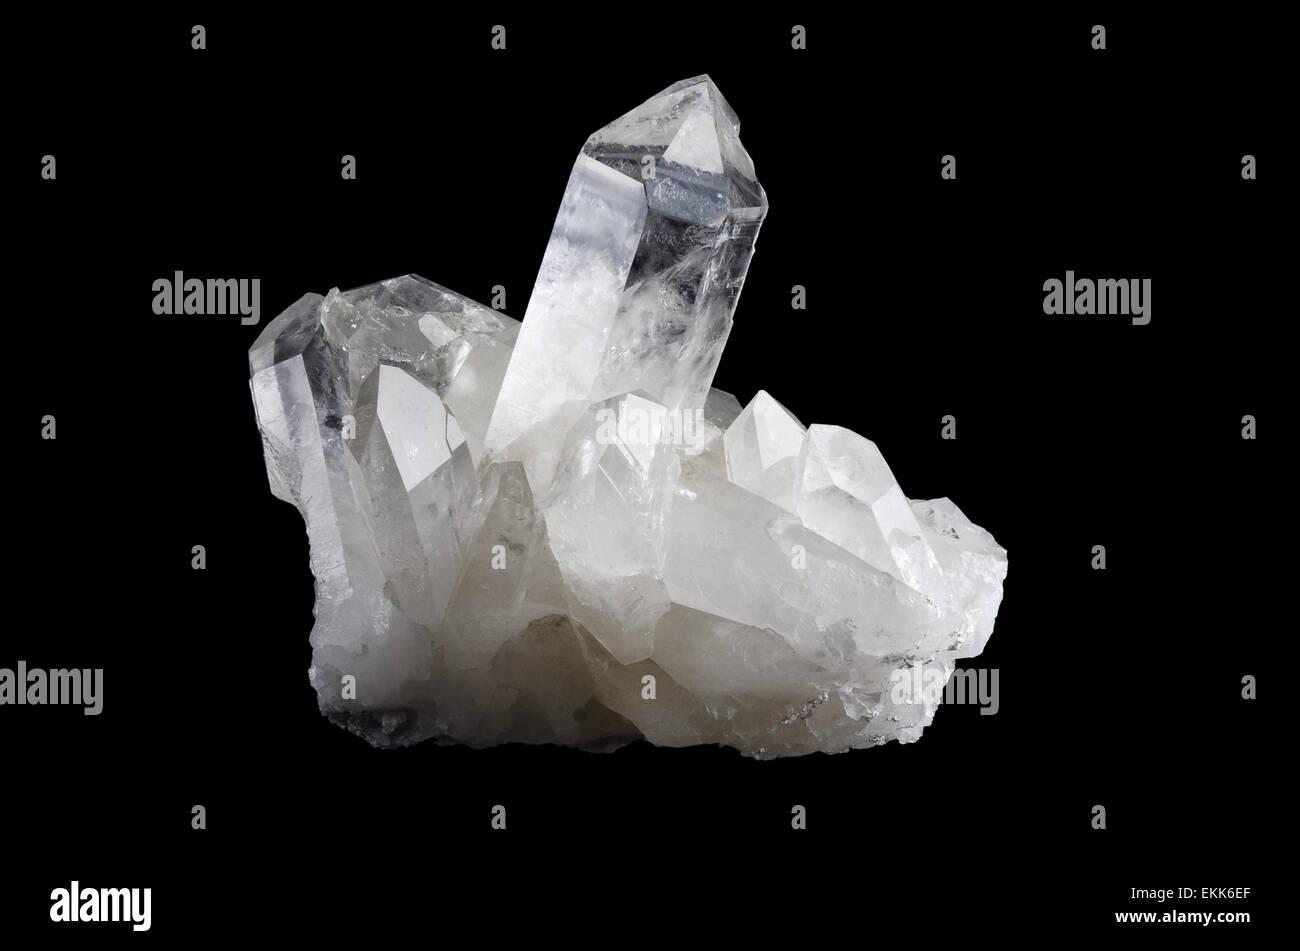 Quartz crystal cluster horizontal on black background, mineral also a semi-precious gemstone. Silica, silicon dioxide, - Stock Image